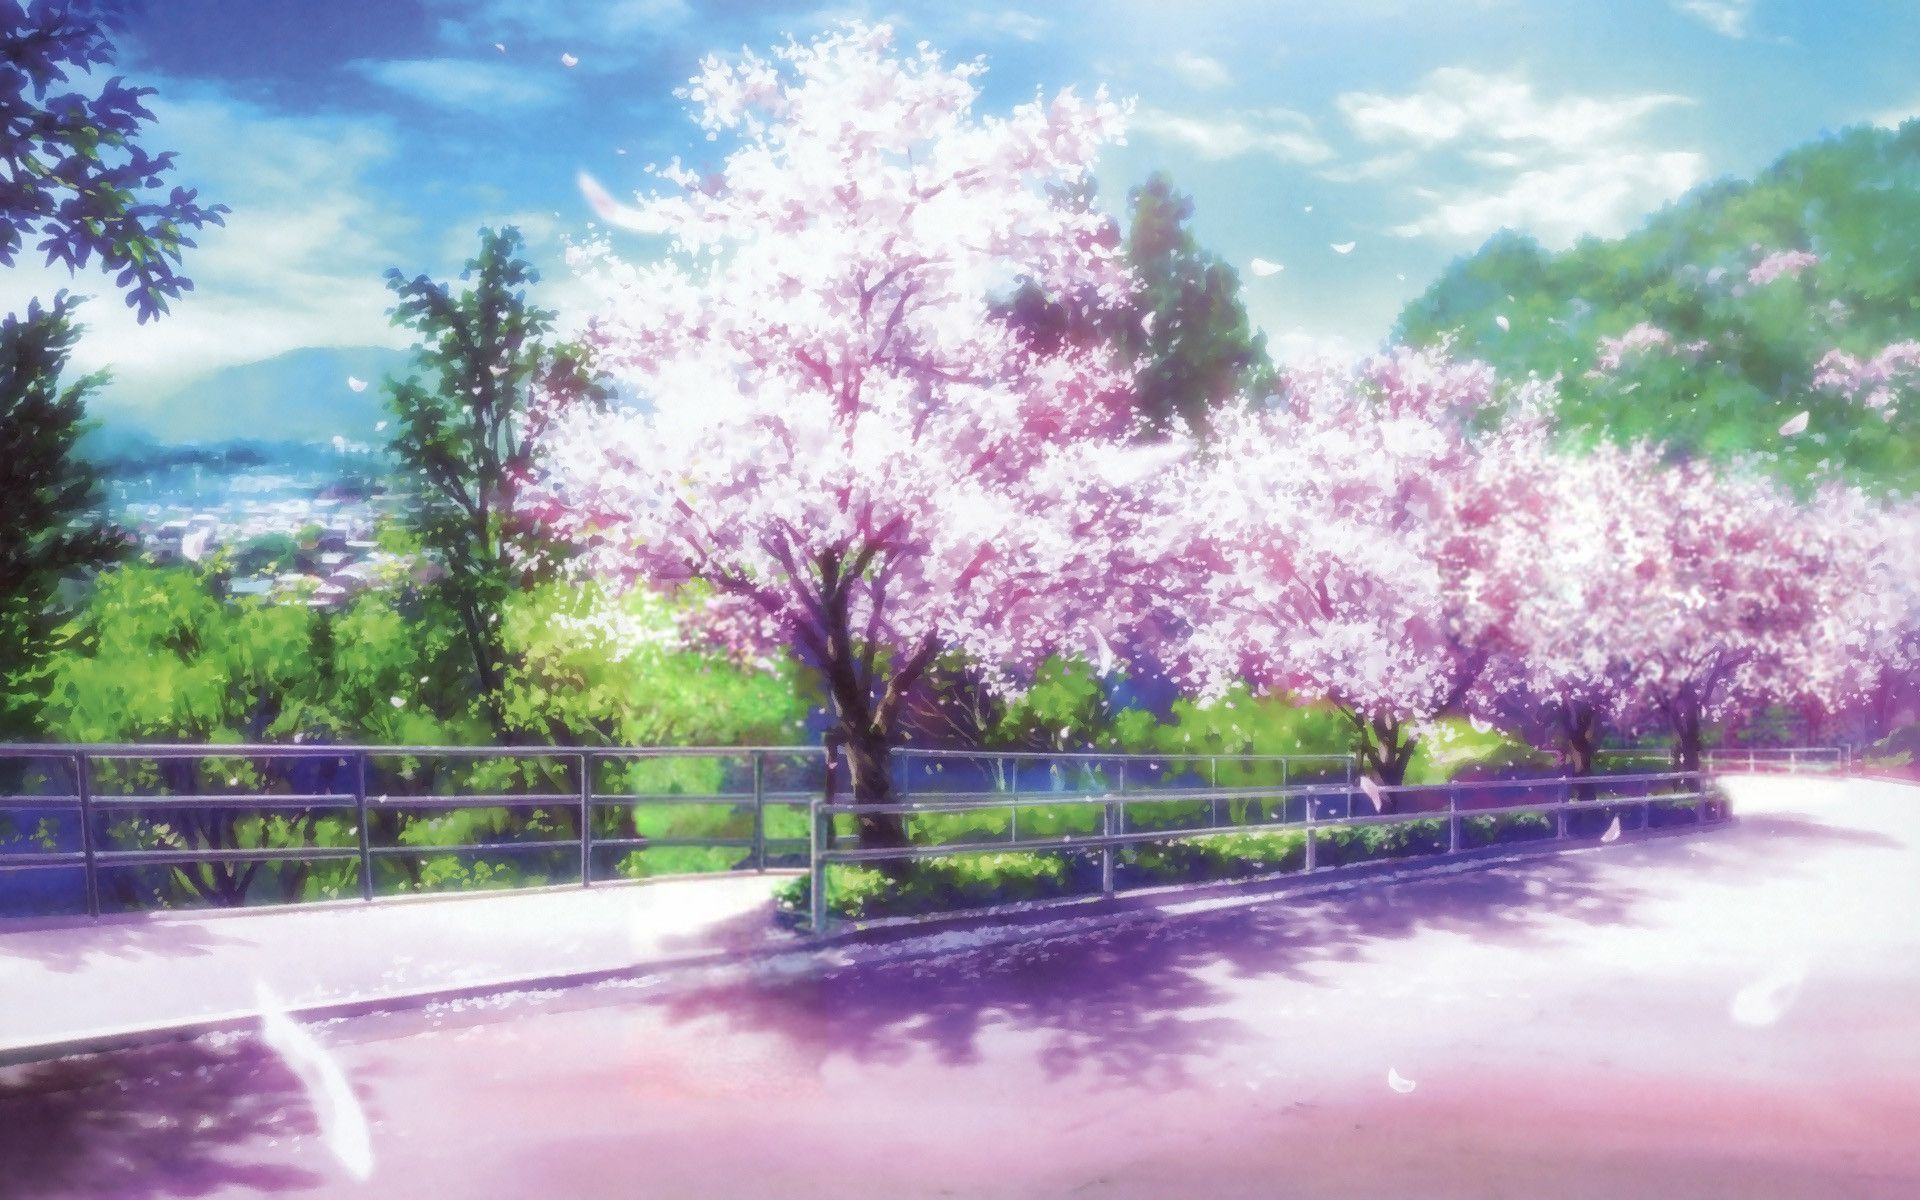 Aesthetic Cherry Blossom Anime Park Http Wallpapersalbum Com Aesthetic Cherry Blossom Anime Park In 2020 Anime Backgrounds Wallpapers Anime Background Anime Scenery